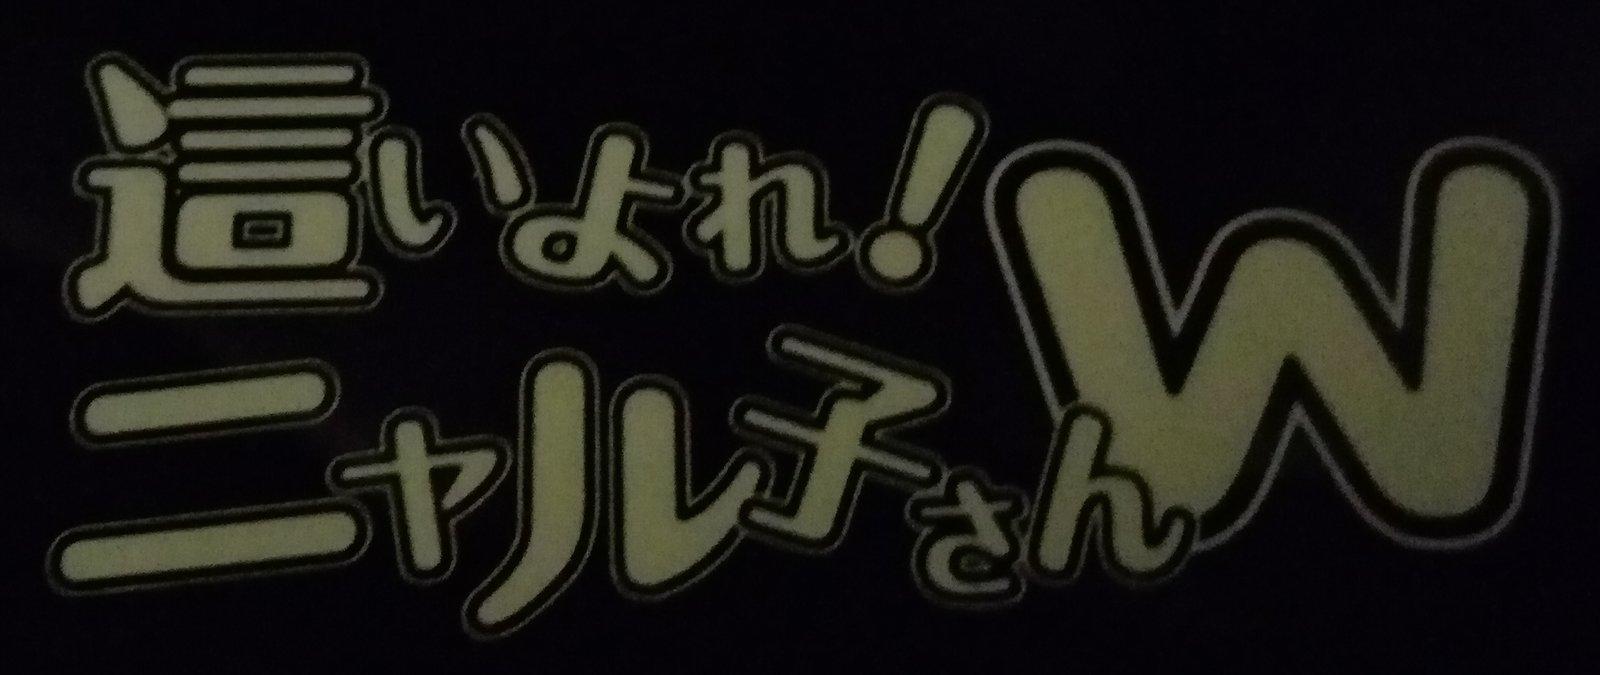 large.59ea899b7da89_Animemystre.jpg.8af5